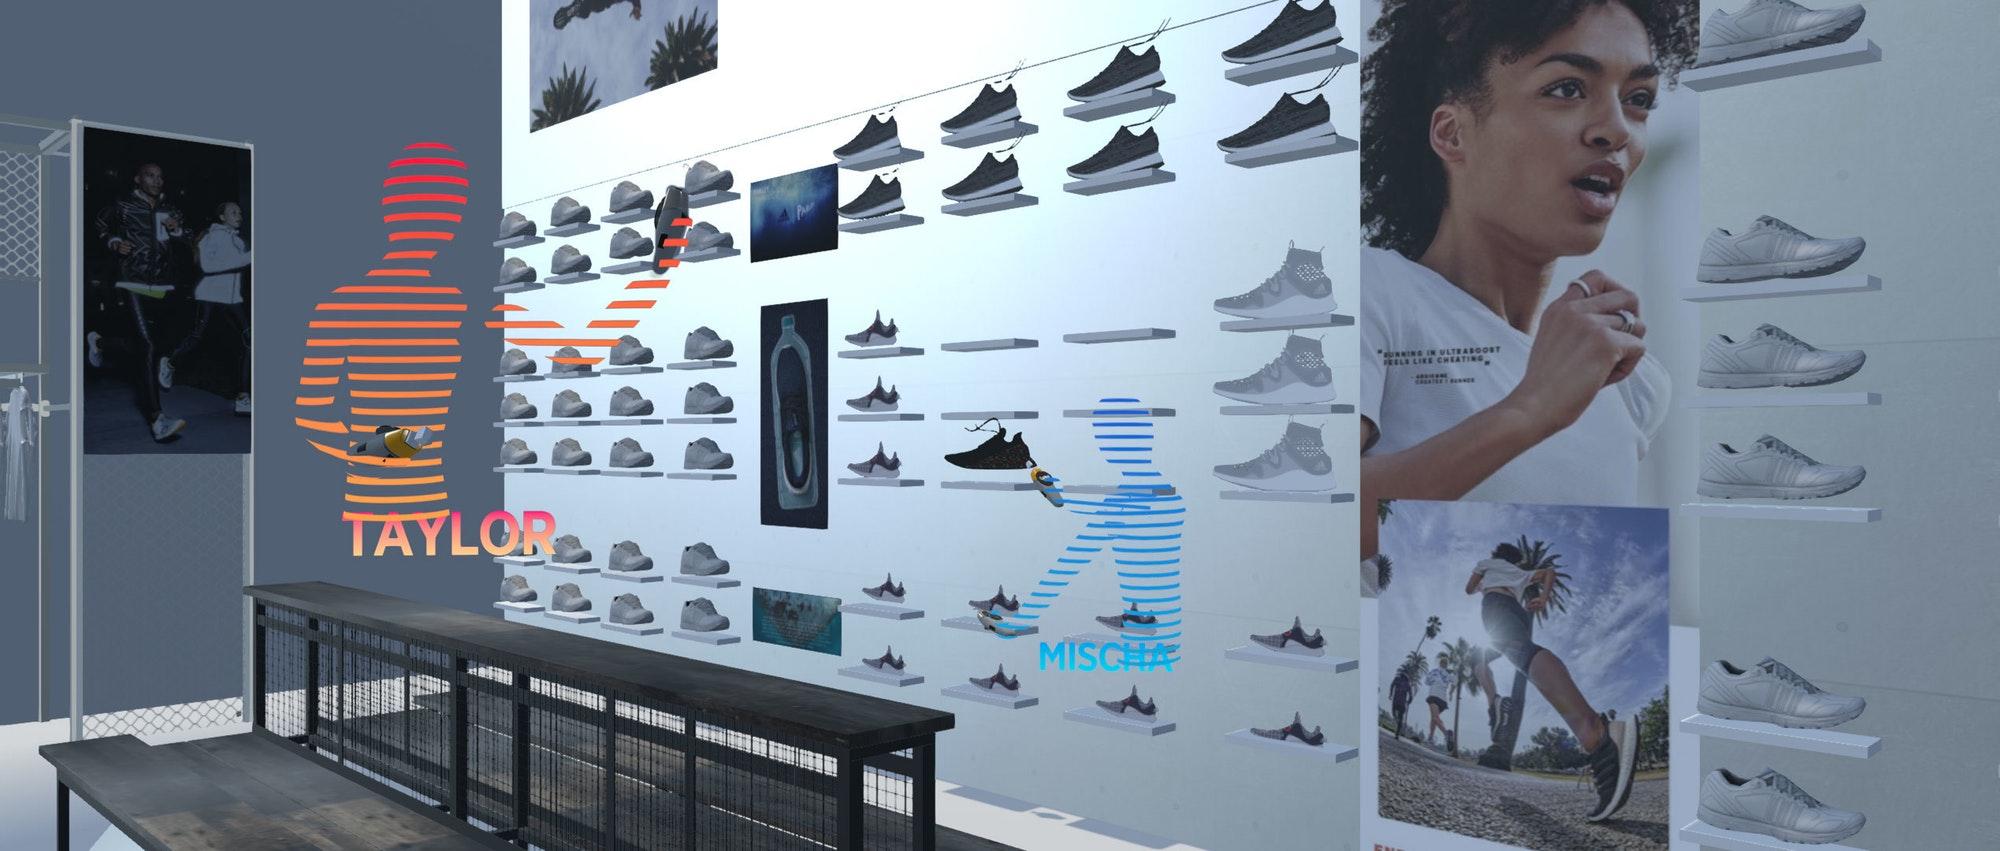 Adidas case study 4